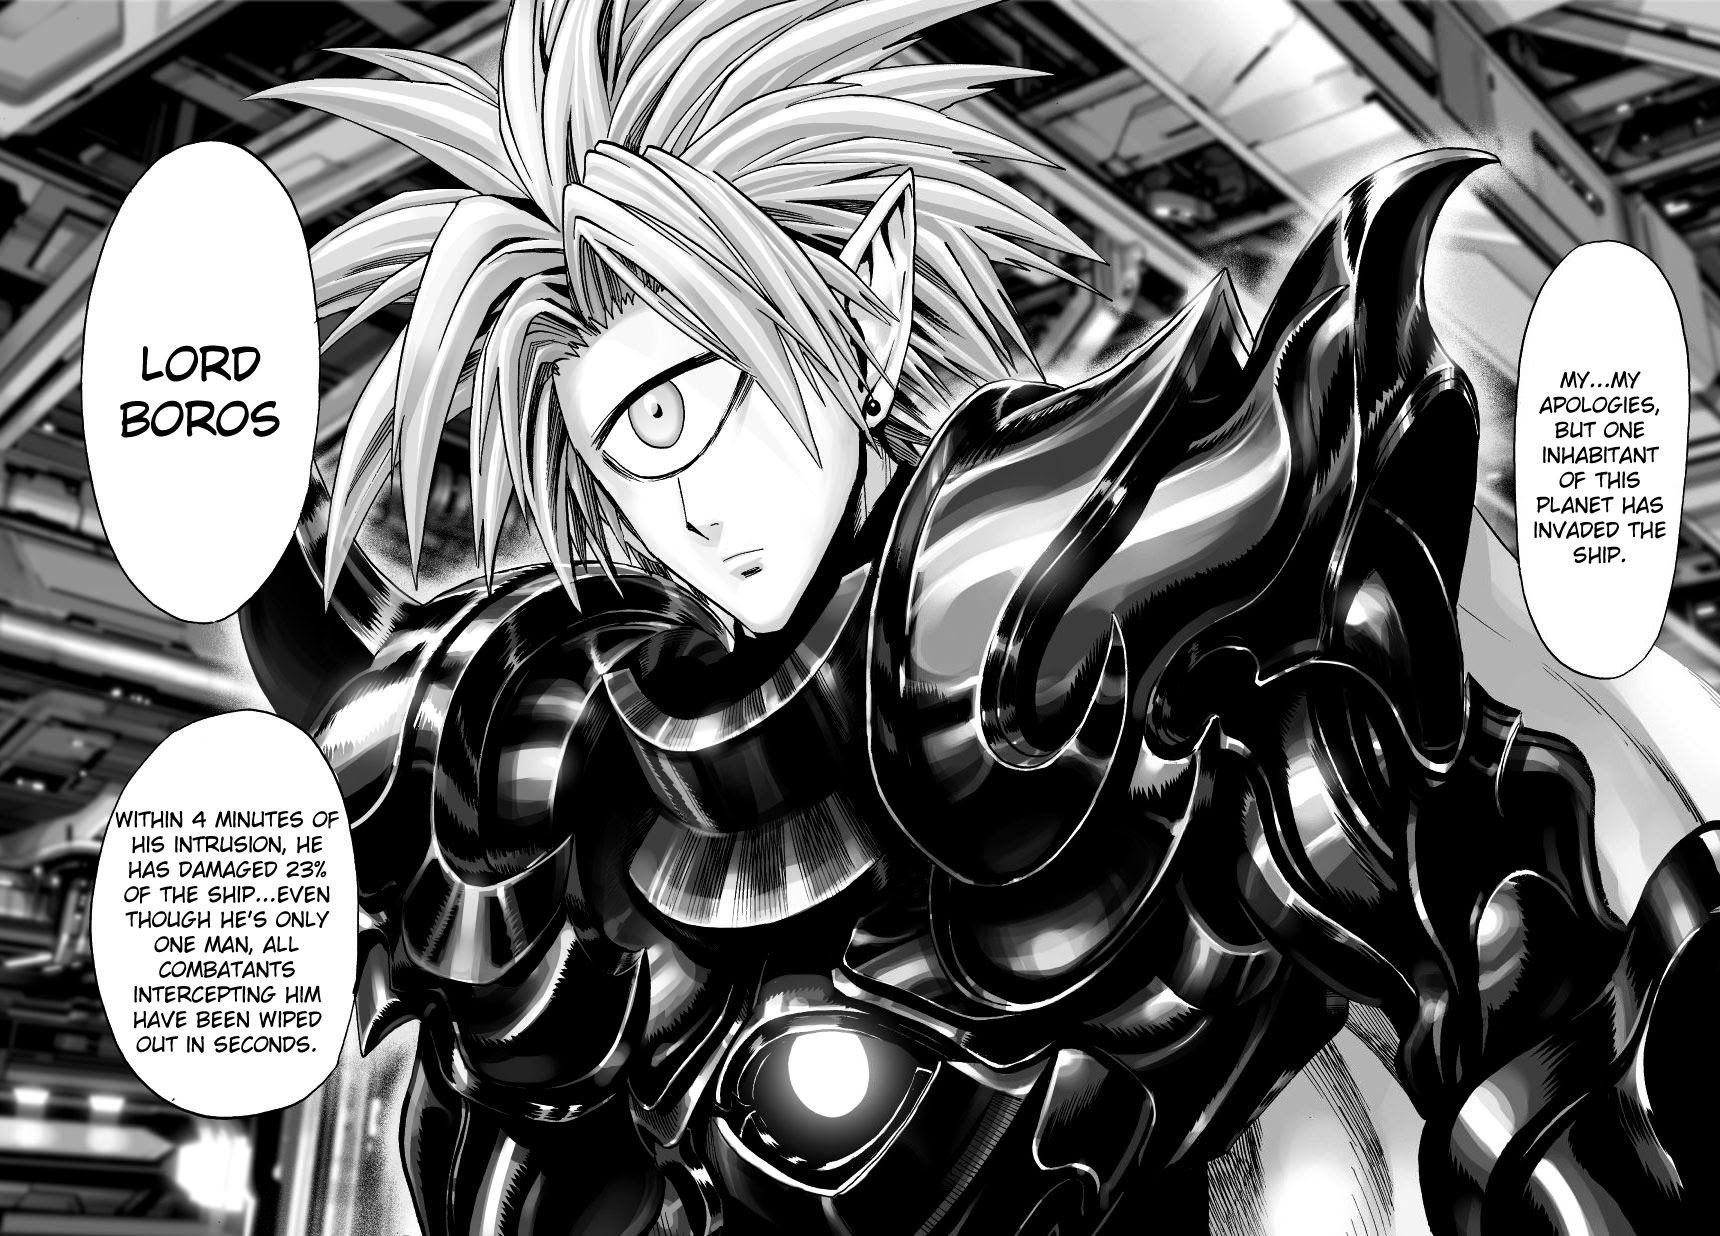 OnePunch Man Lord Boros manga 1.jpg Tela de bloqueio e